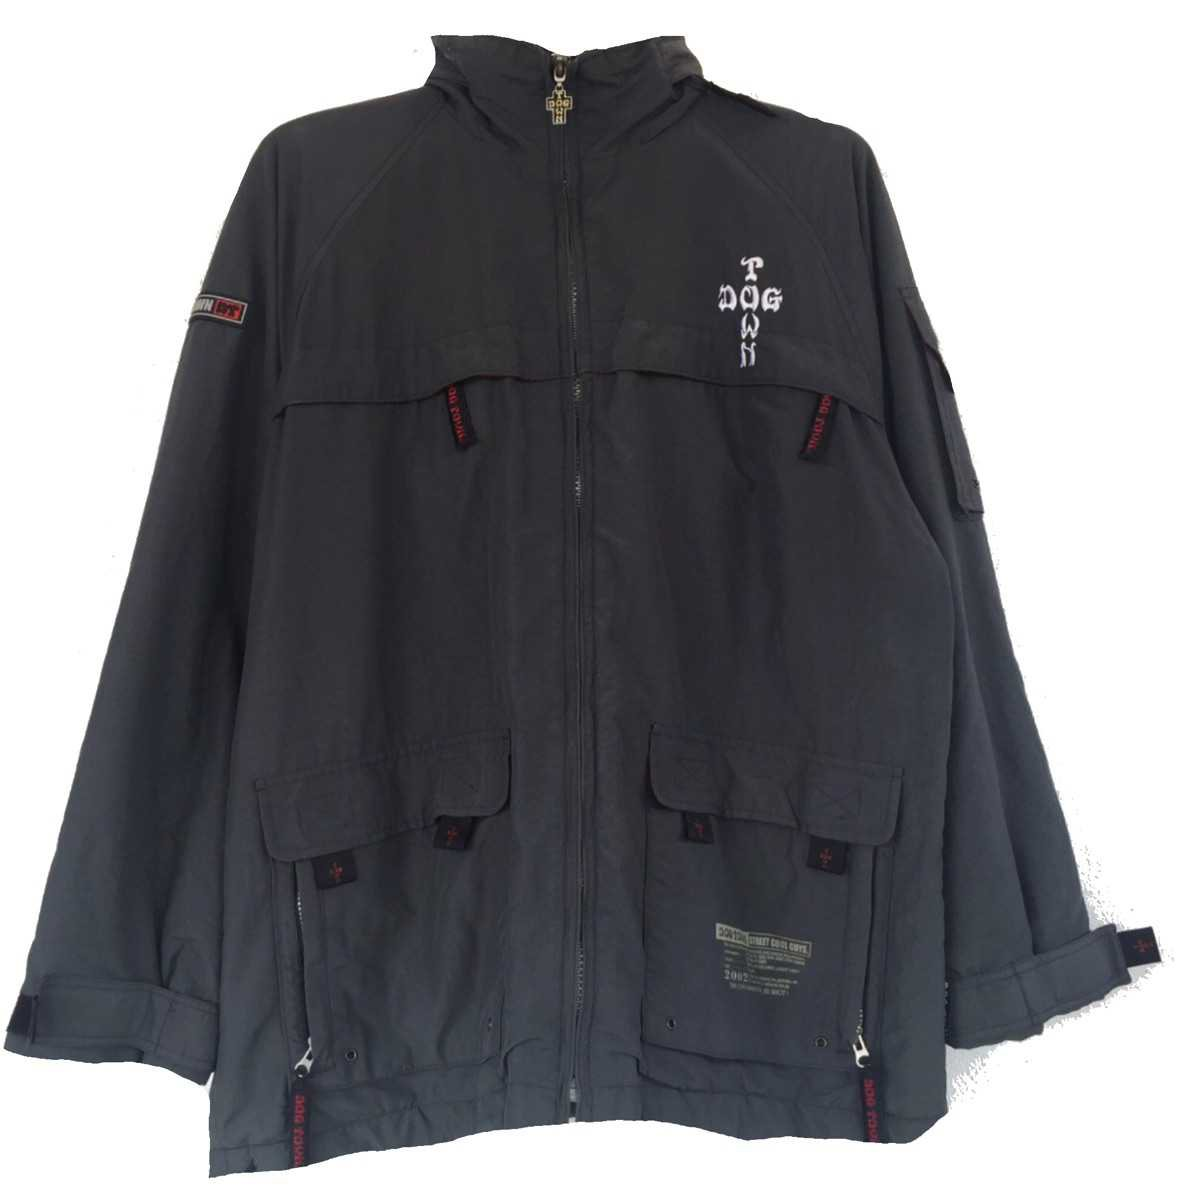 dogtown jacket